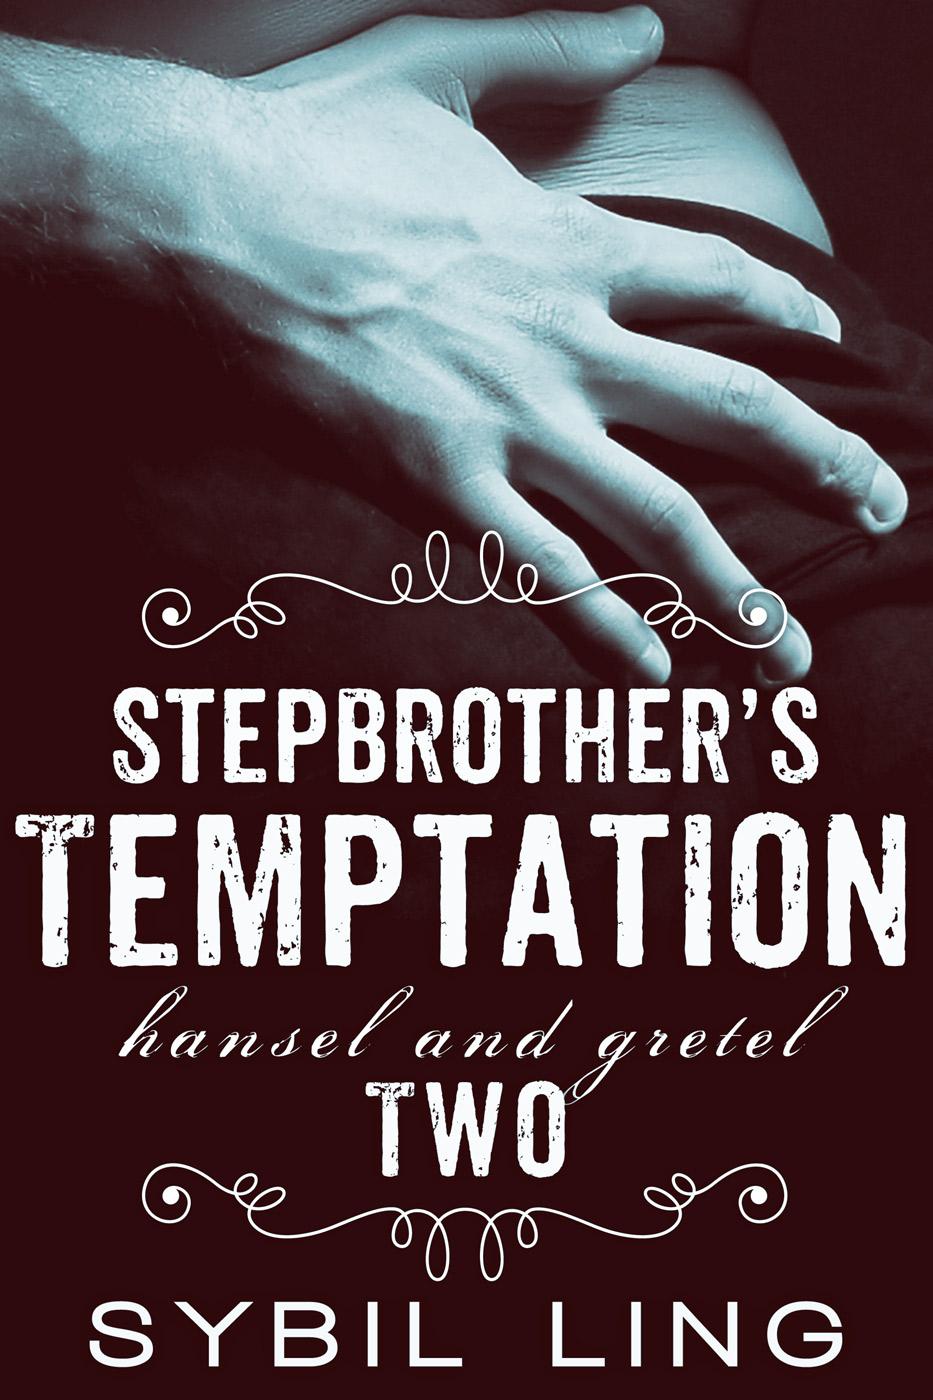 Stepbrother's temptation (hansel & gretel #2)